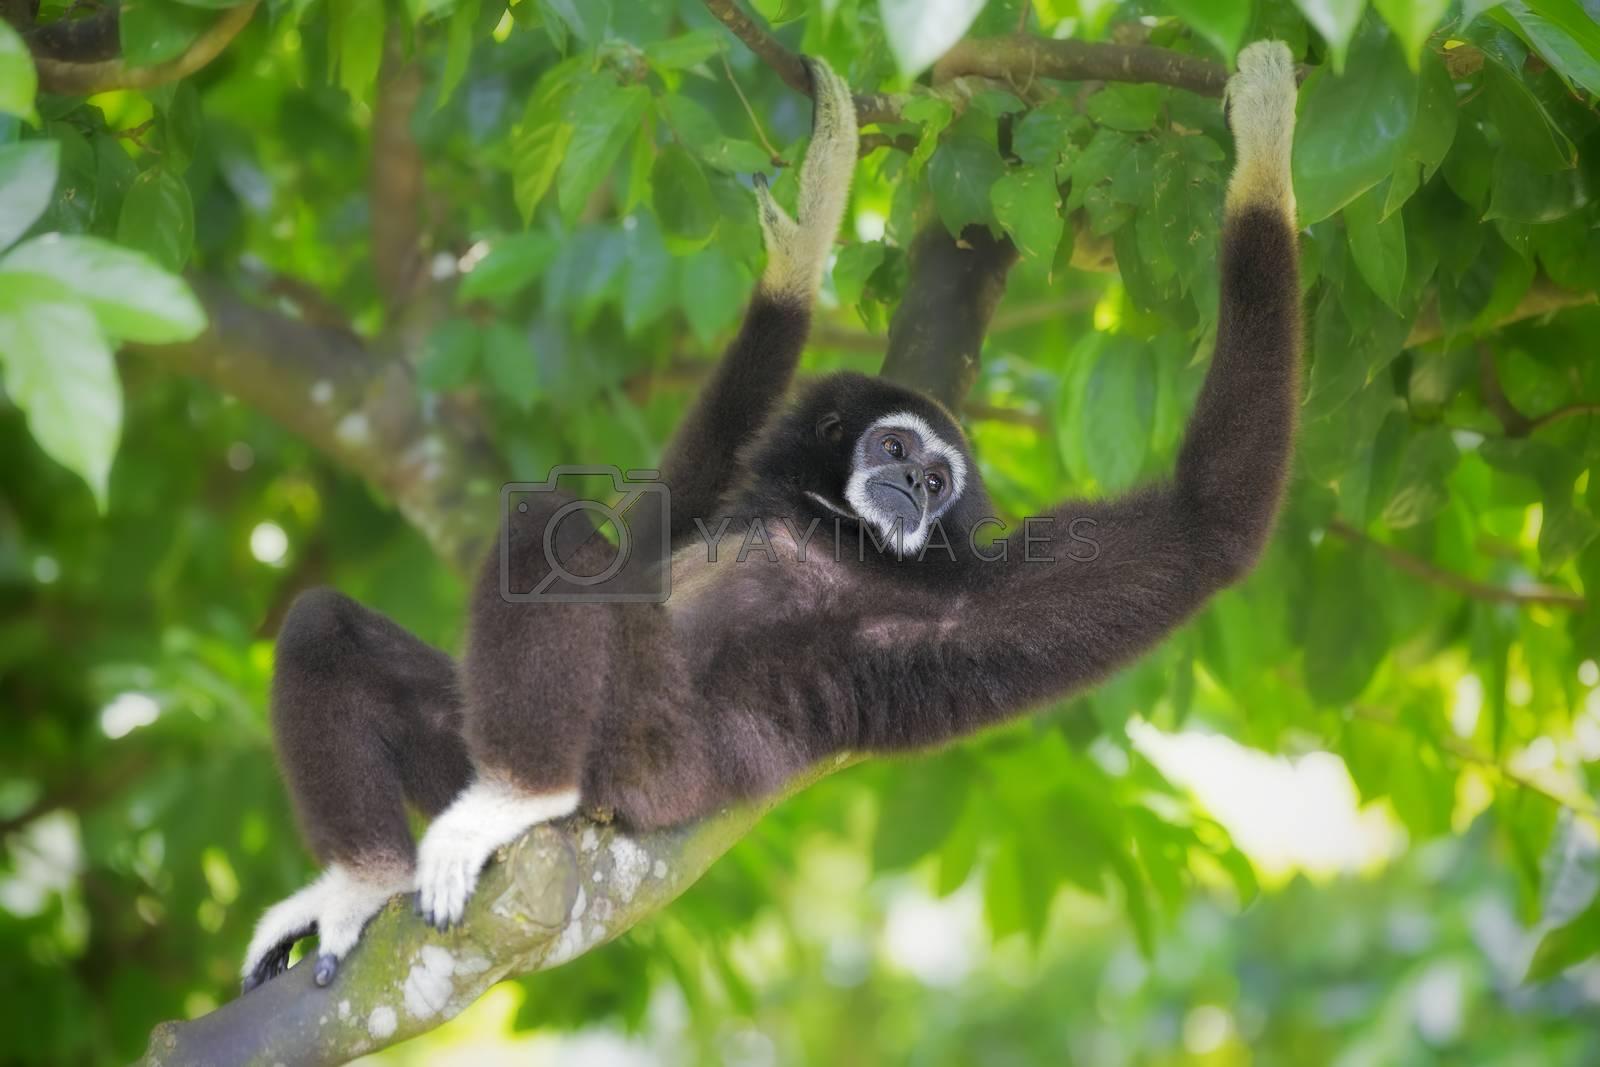 Gibbon monkey in Kota Kinabalu, Borneo, Malaysia